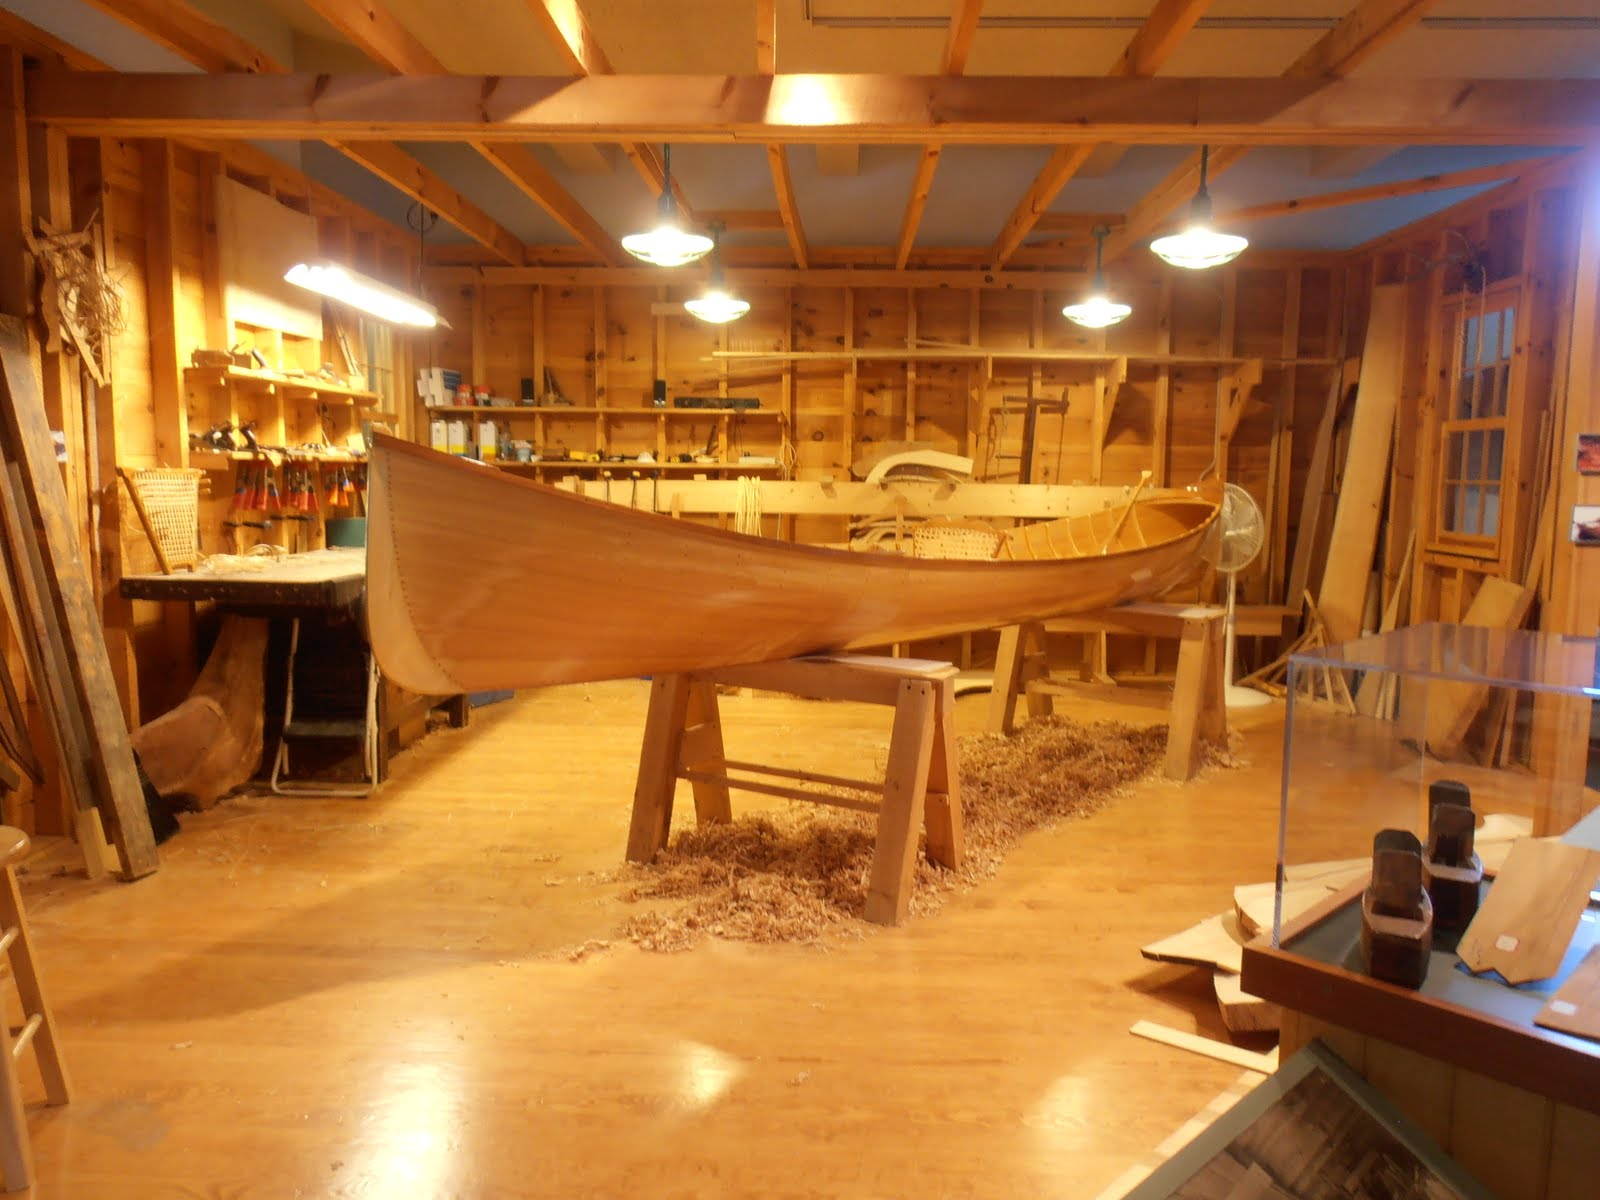 Adirondack museum guide boat plans